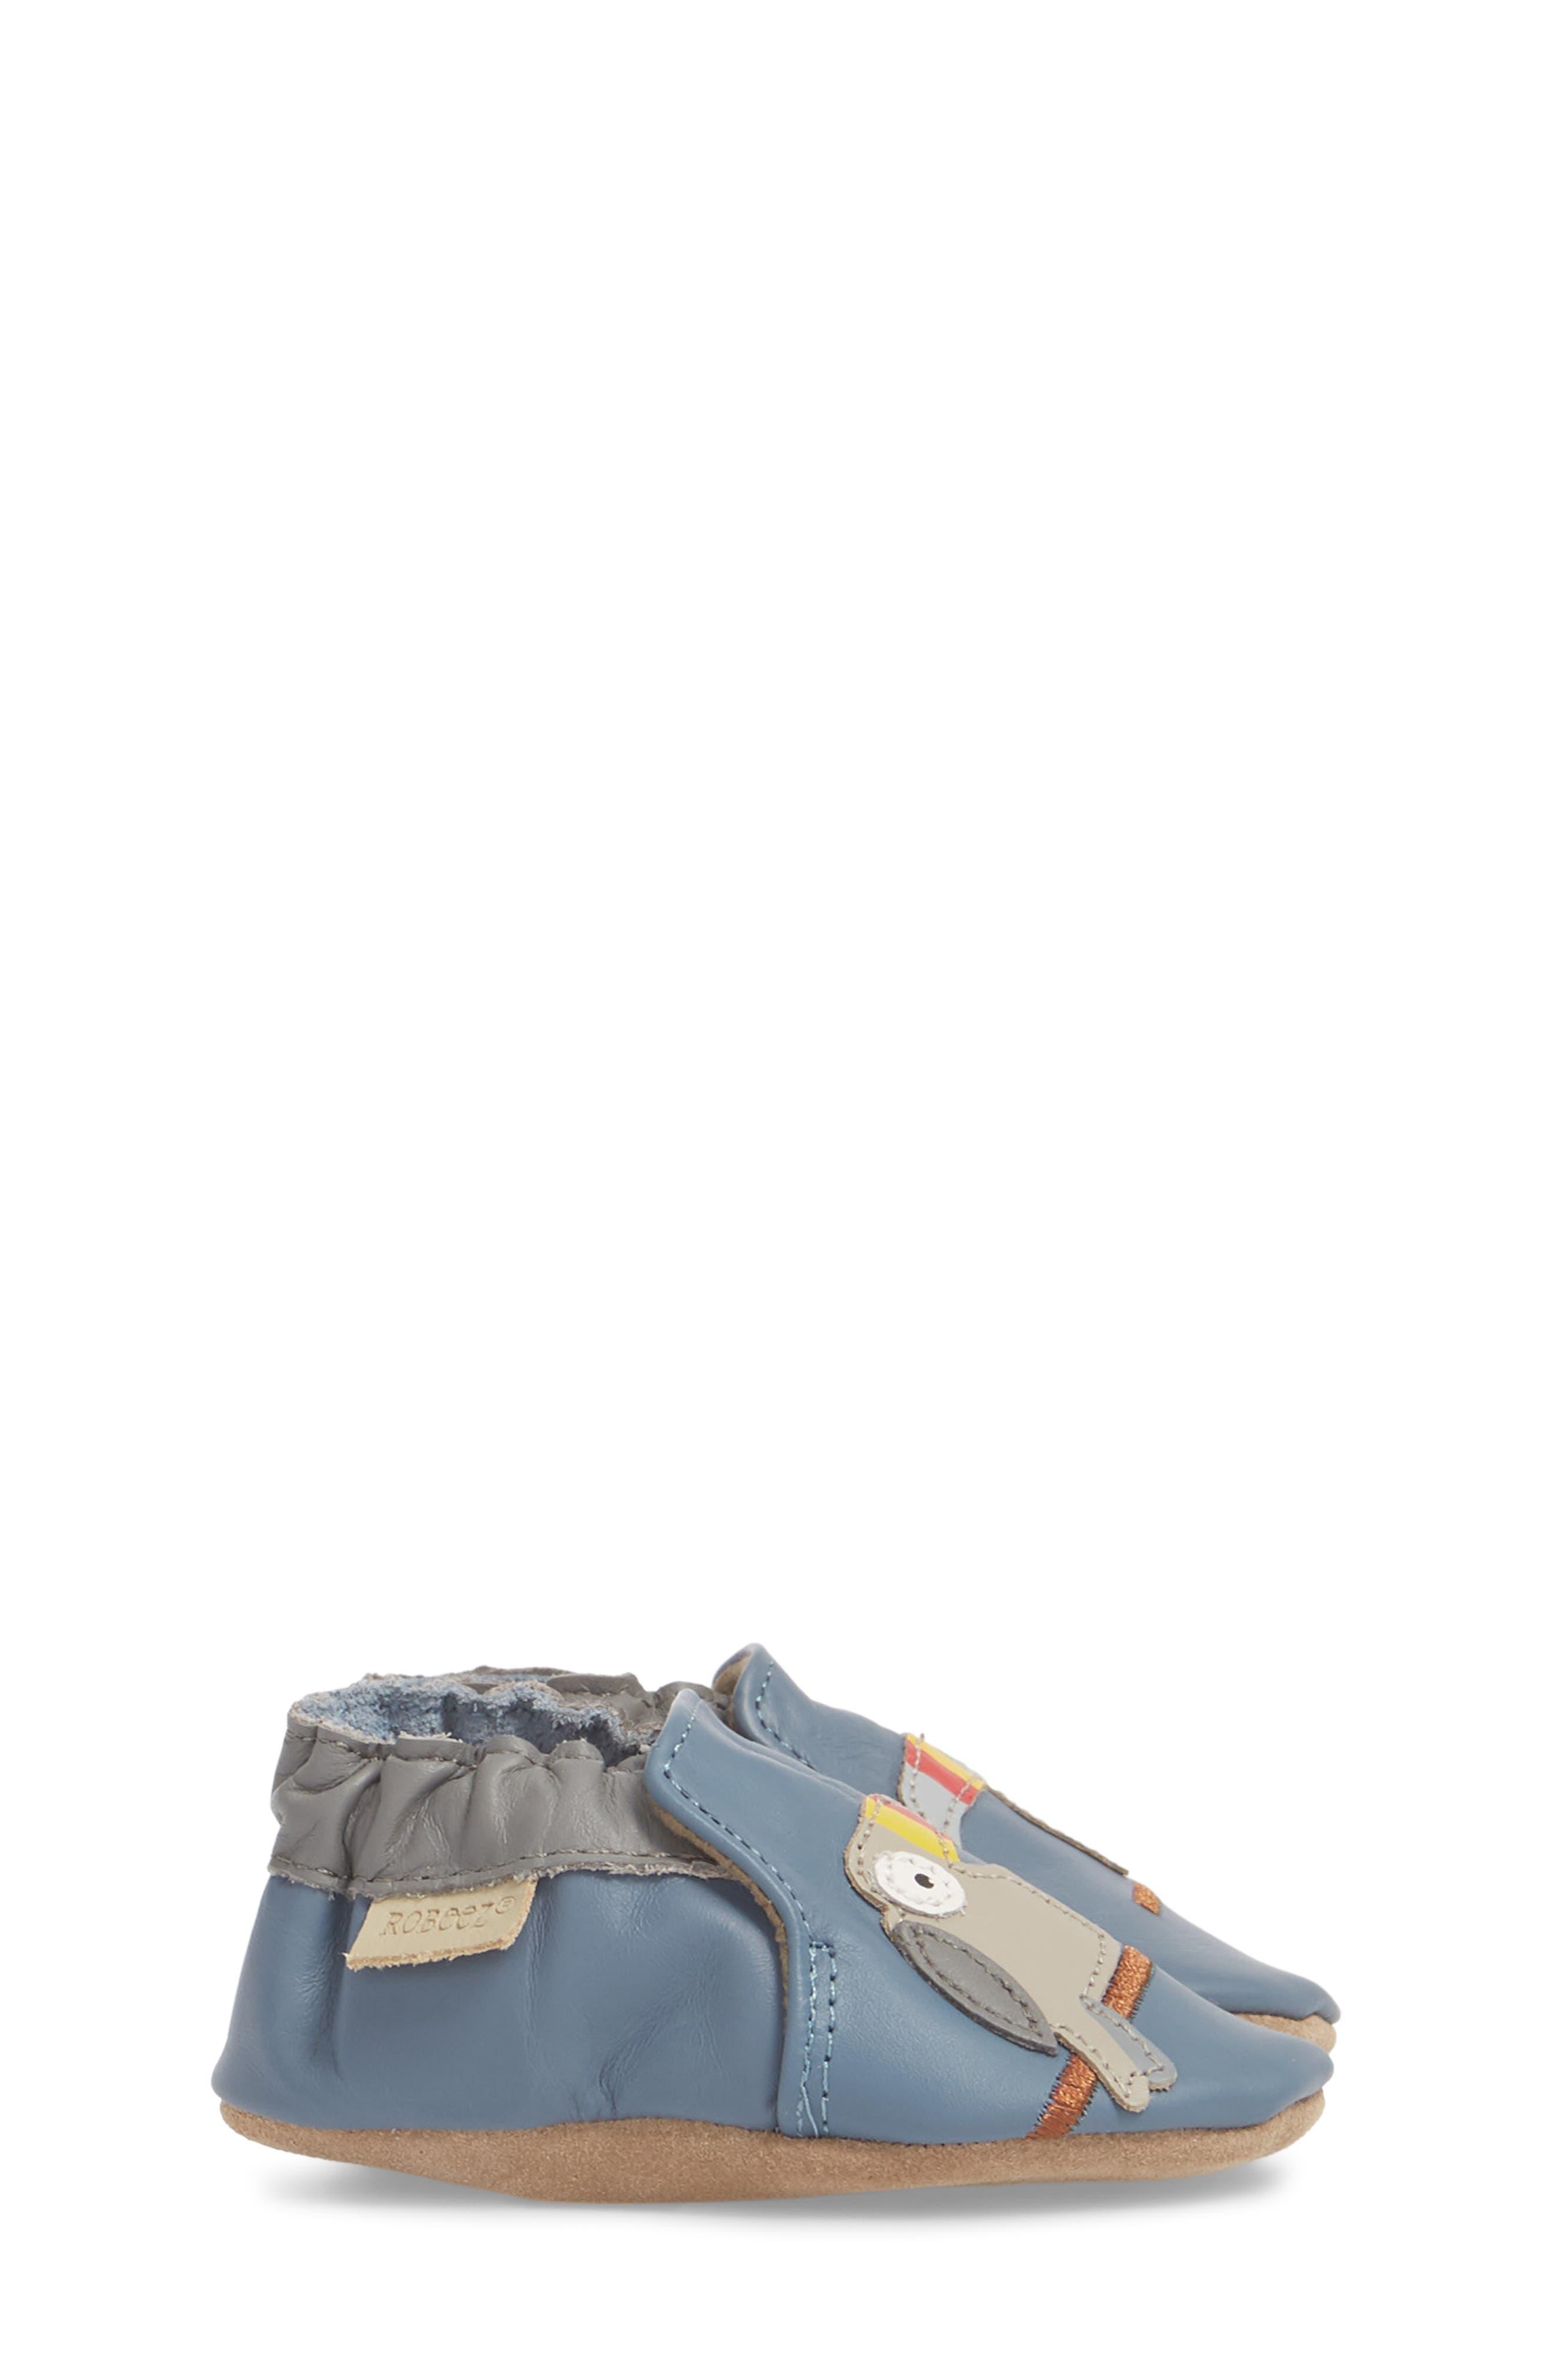 Toucan Tom Moccasin Crib Shoe,                             Alternate thumbnail 3, color,                             450